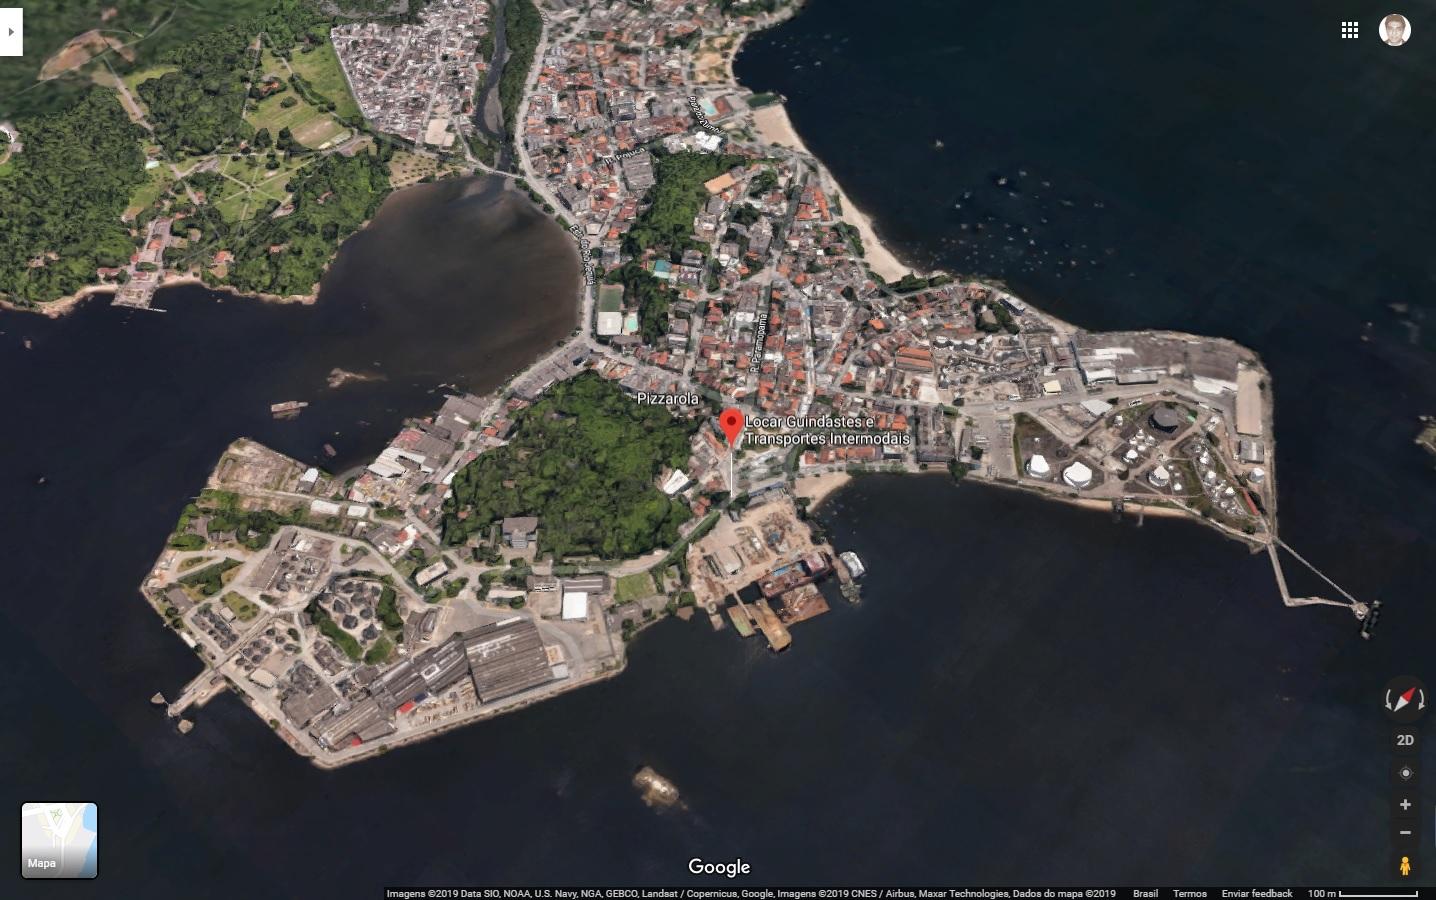 Estaleiro - ilha do Governador - 7.394,00m2 + 2.465,00m2 edificados